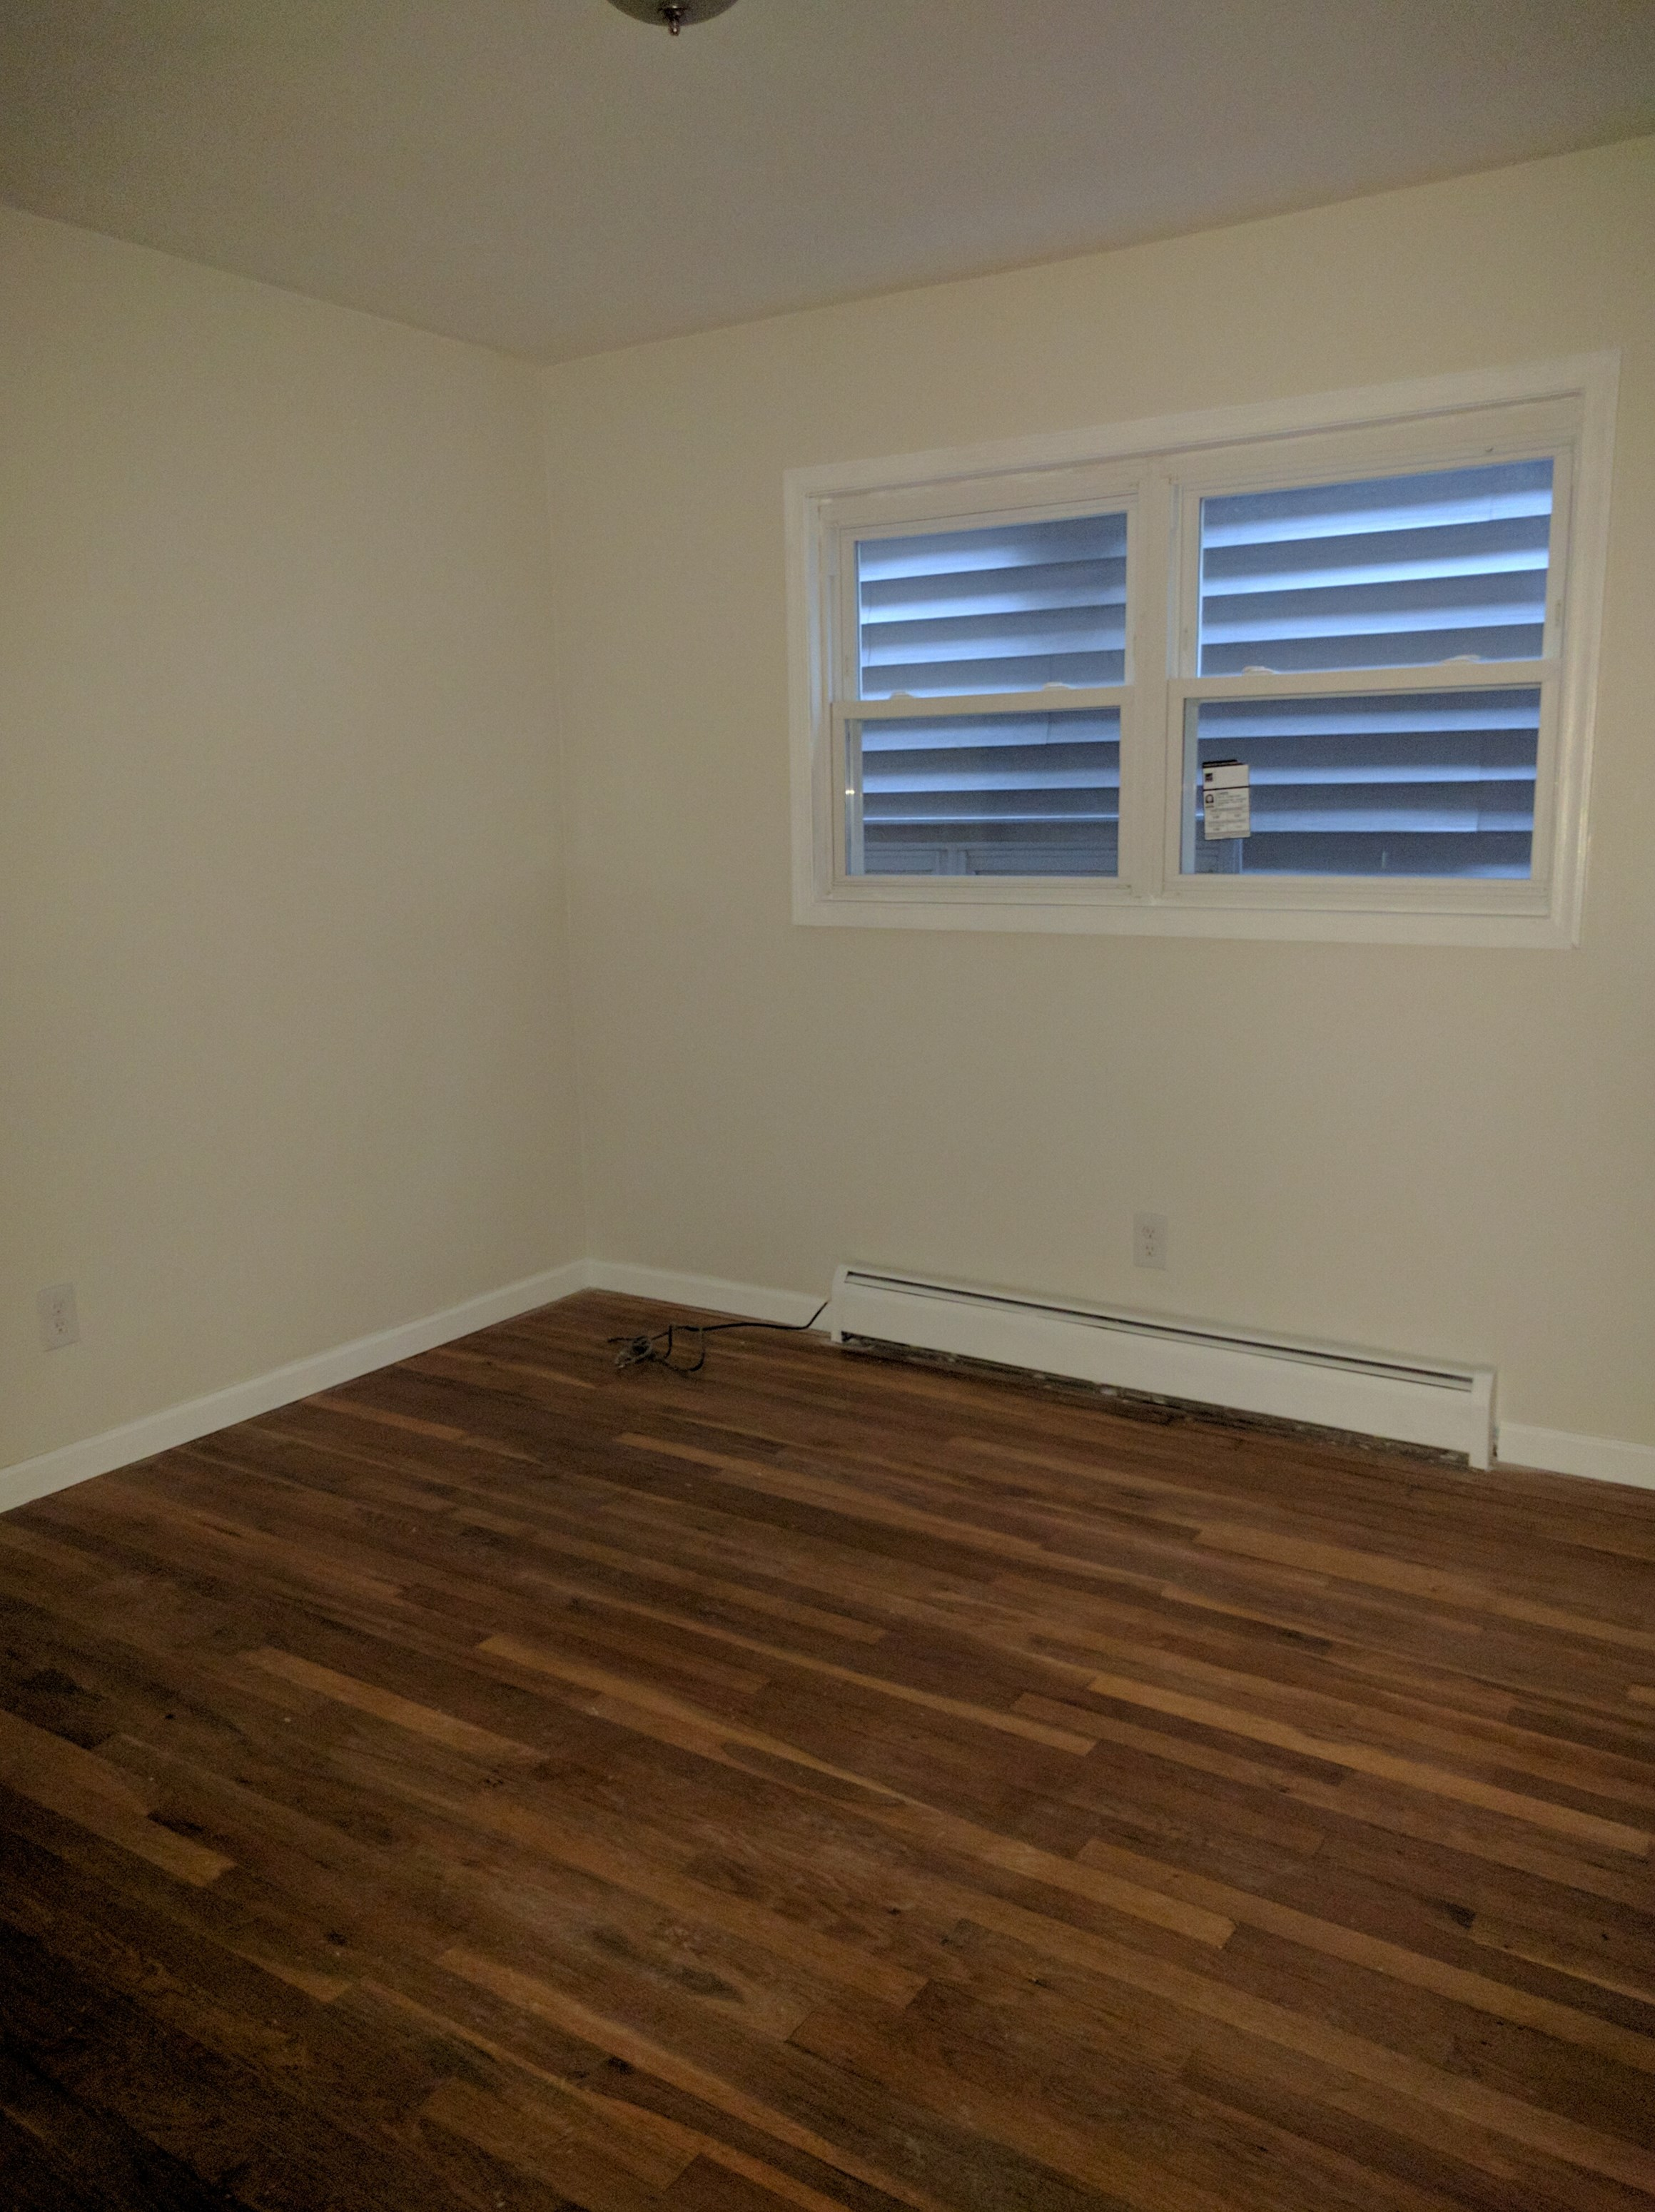 1 bedroom apartments in winston salem nc mattress bedroom sets in augusta ga 1 bedroom apartments in winston s picture on 3 bedroom apt